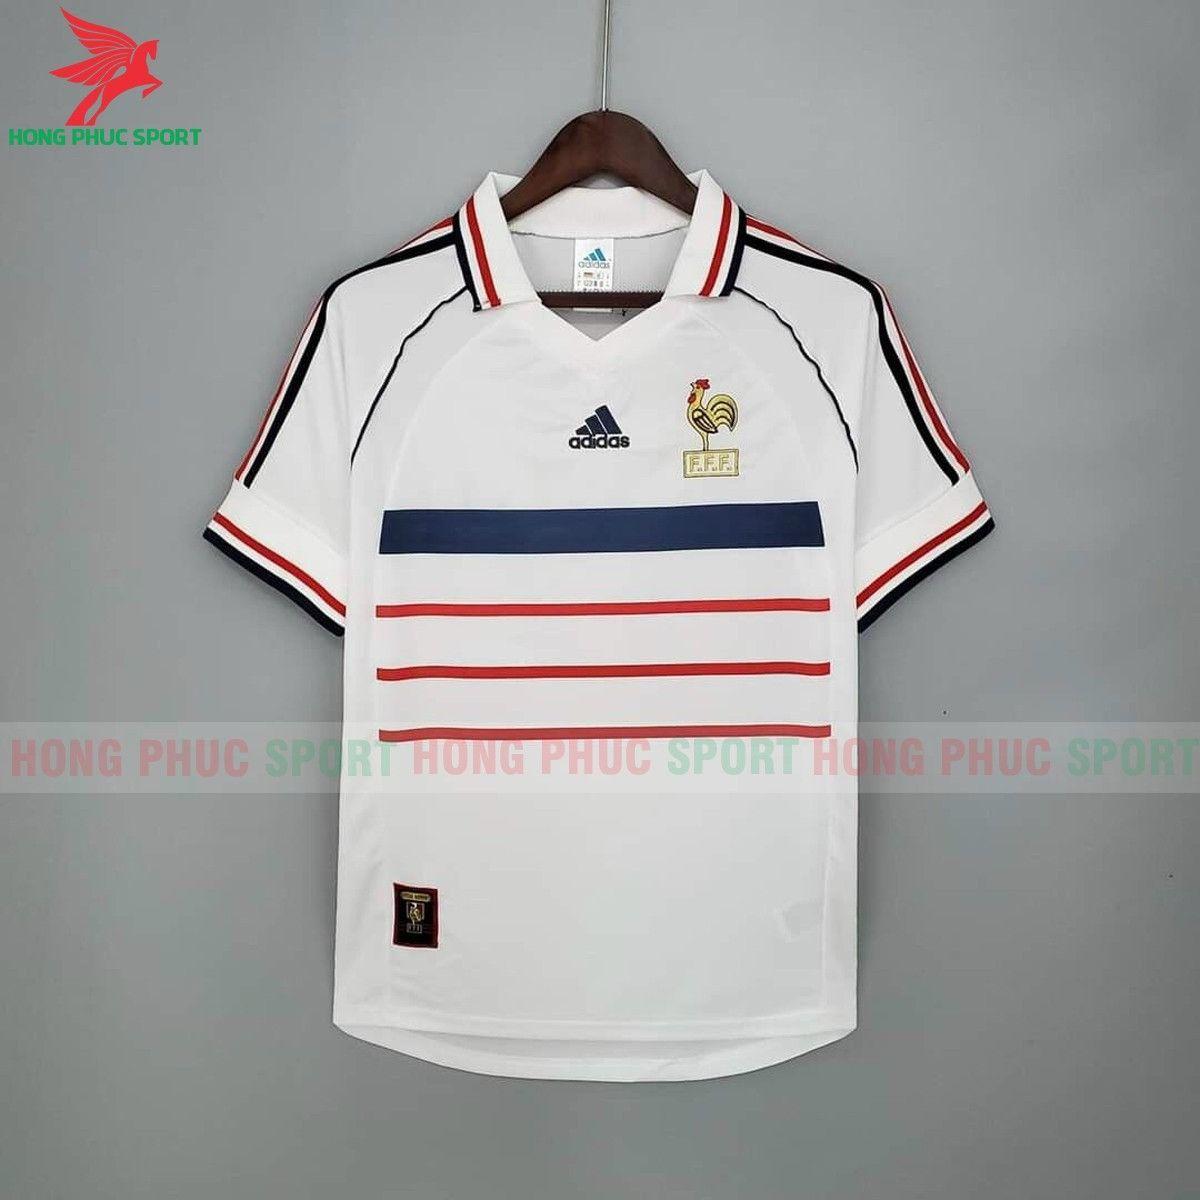 https://cdn.hongphucsport.com/unsafe/s4.shopbay.vn/files/285/ao-bong-da-phap-world-cup-1998-h-614aae3ebfcb4.jpg